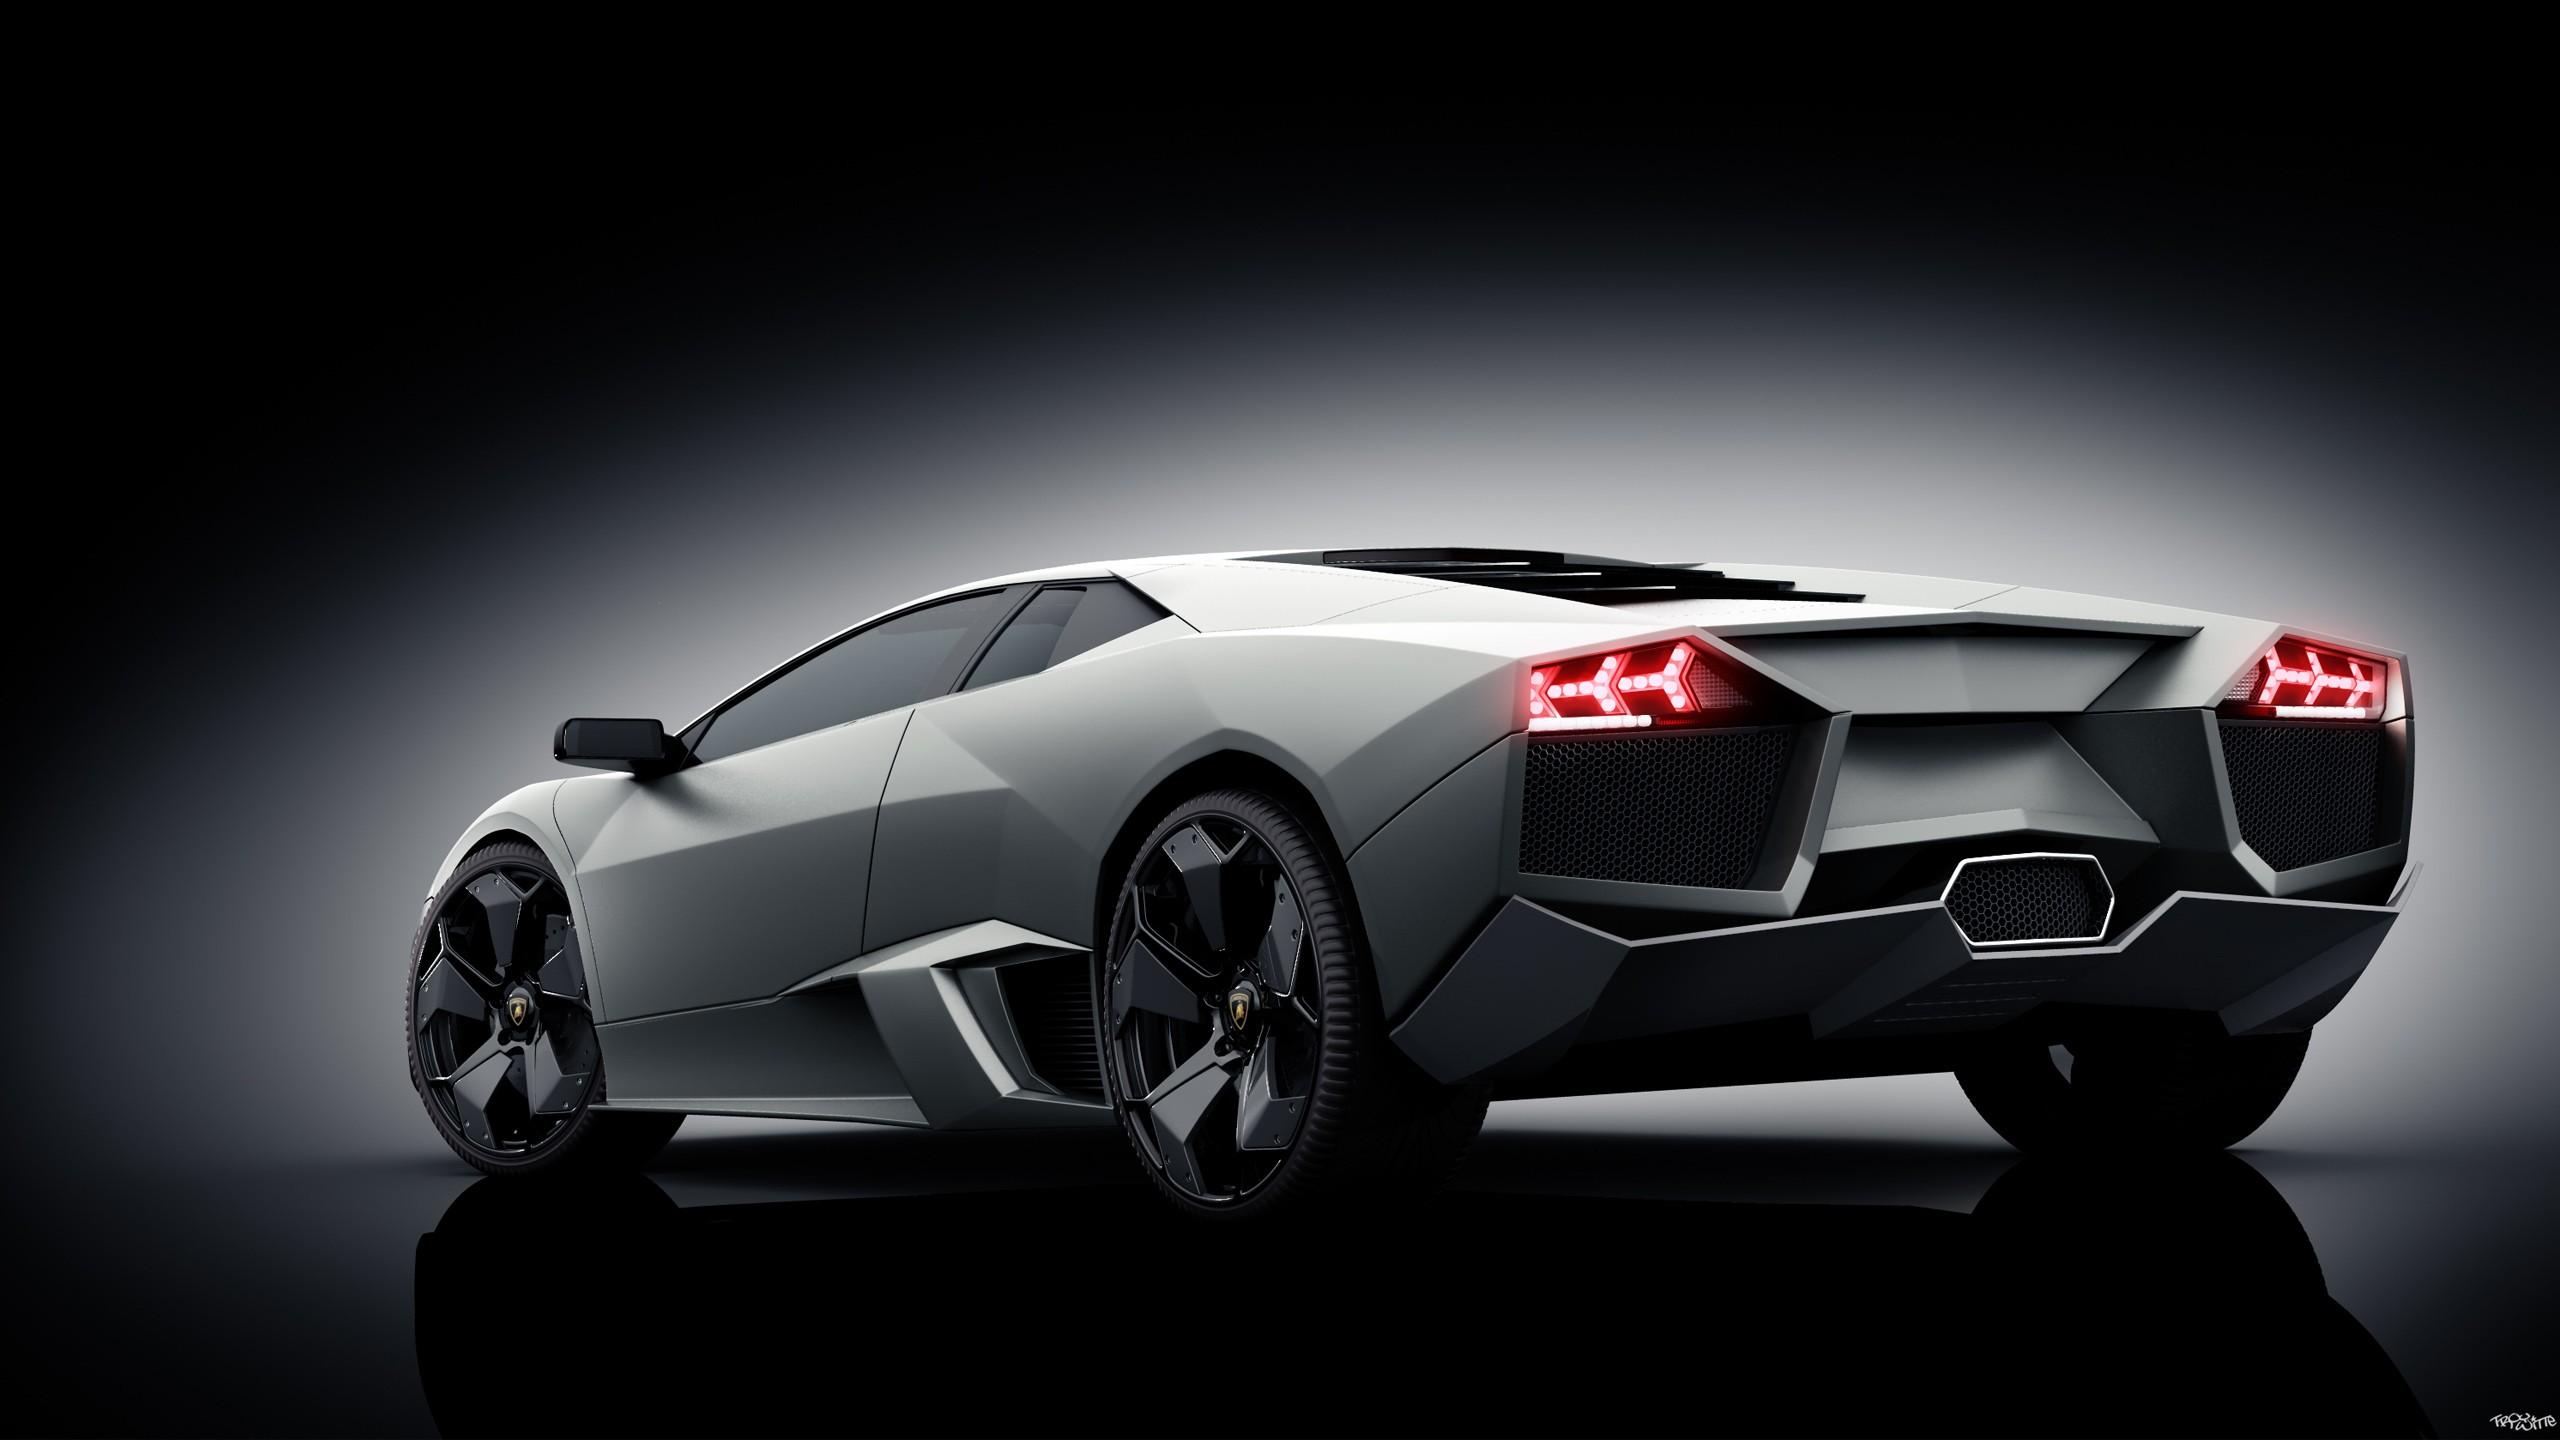 Best Iphone 5 Home Screen Wallpapers The Lamborghini Reventon Concept 2 Wallpaper Hd Car